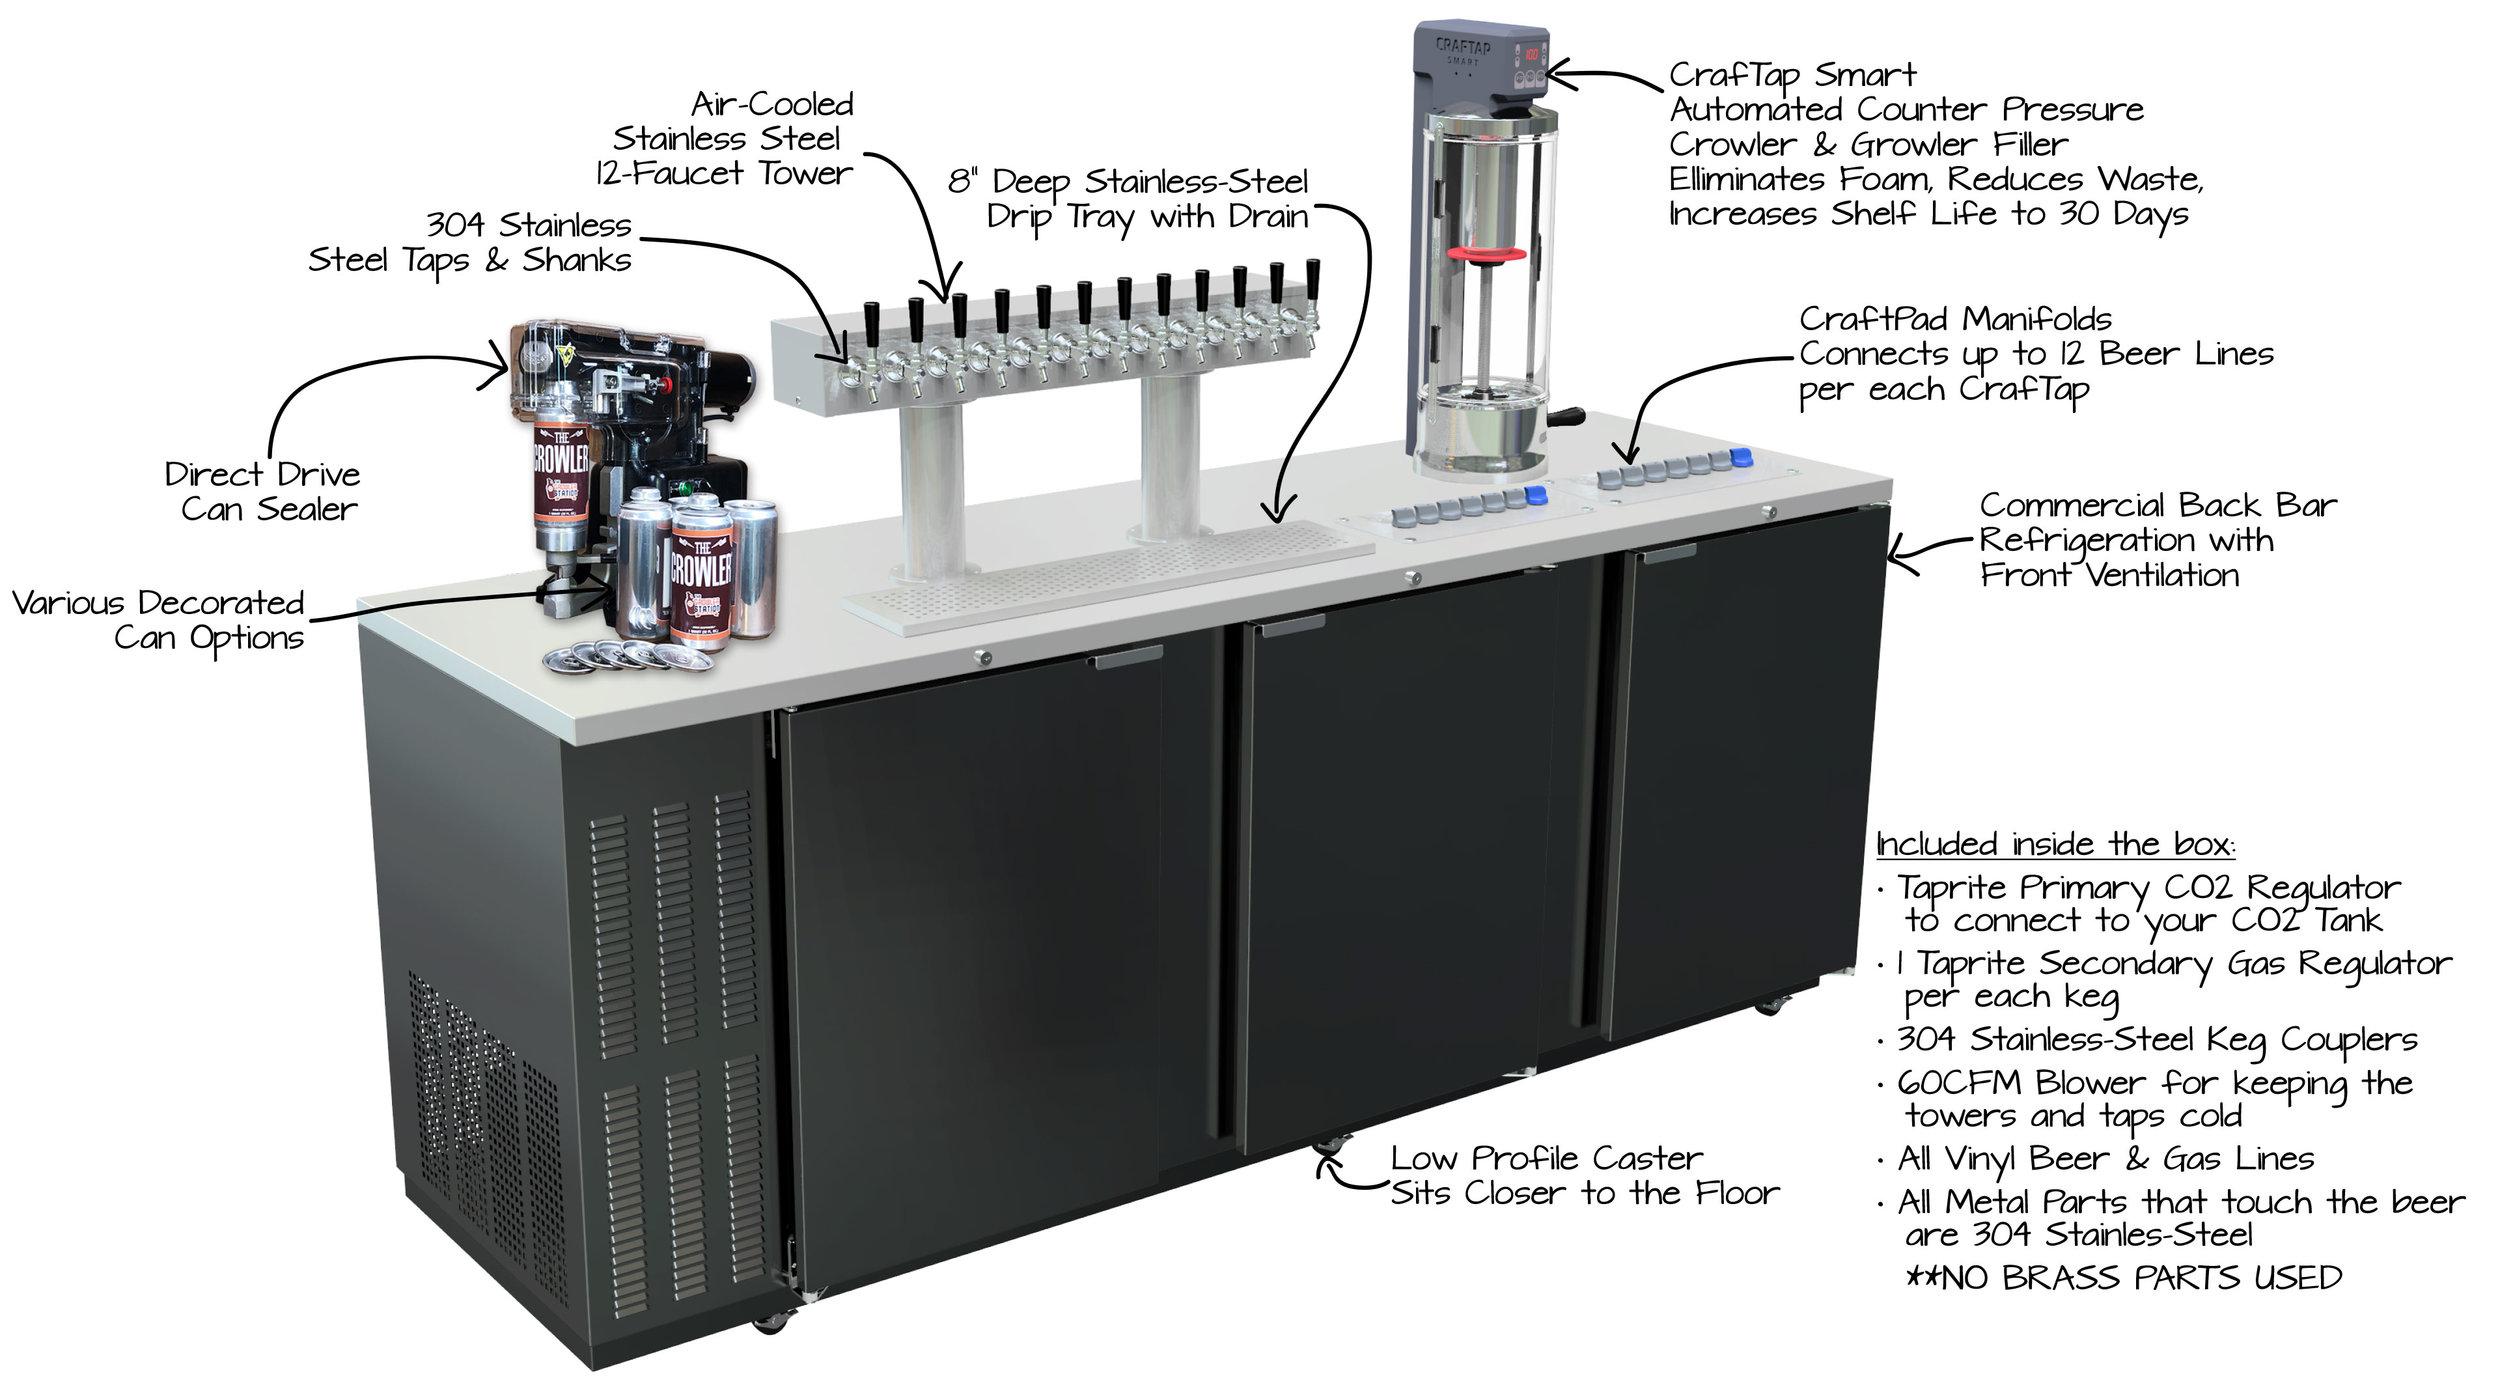 CTSmart-Kiosk-Image-with-Notes(web).jpg